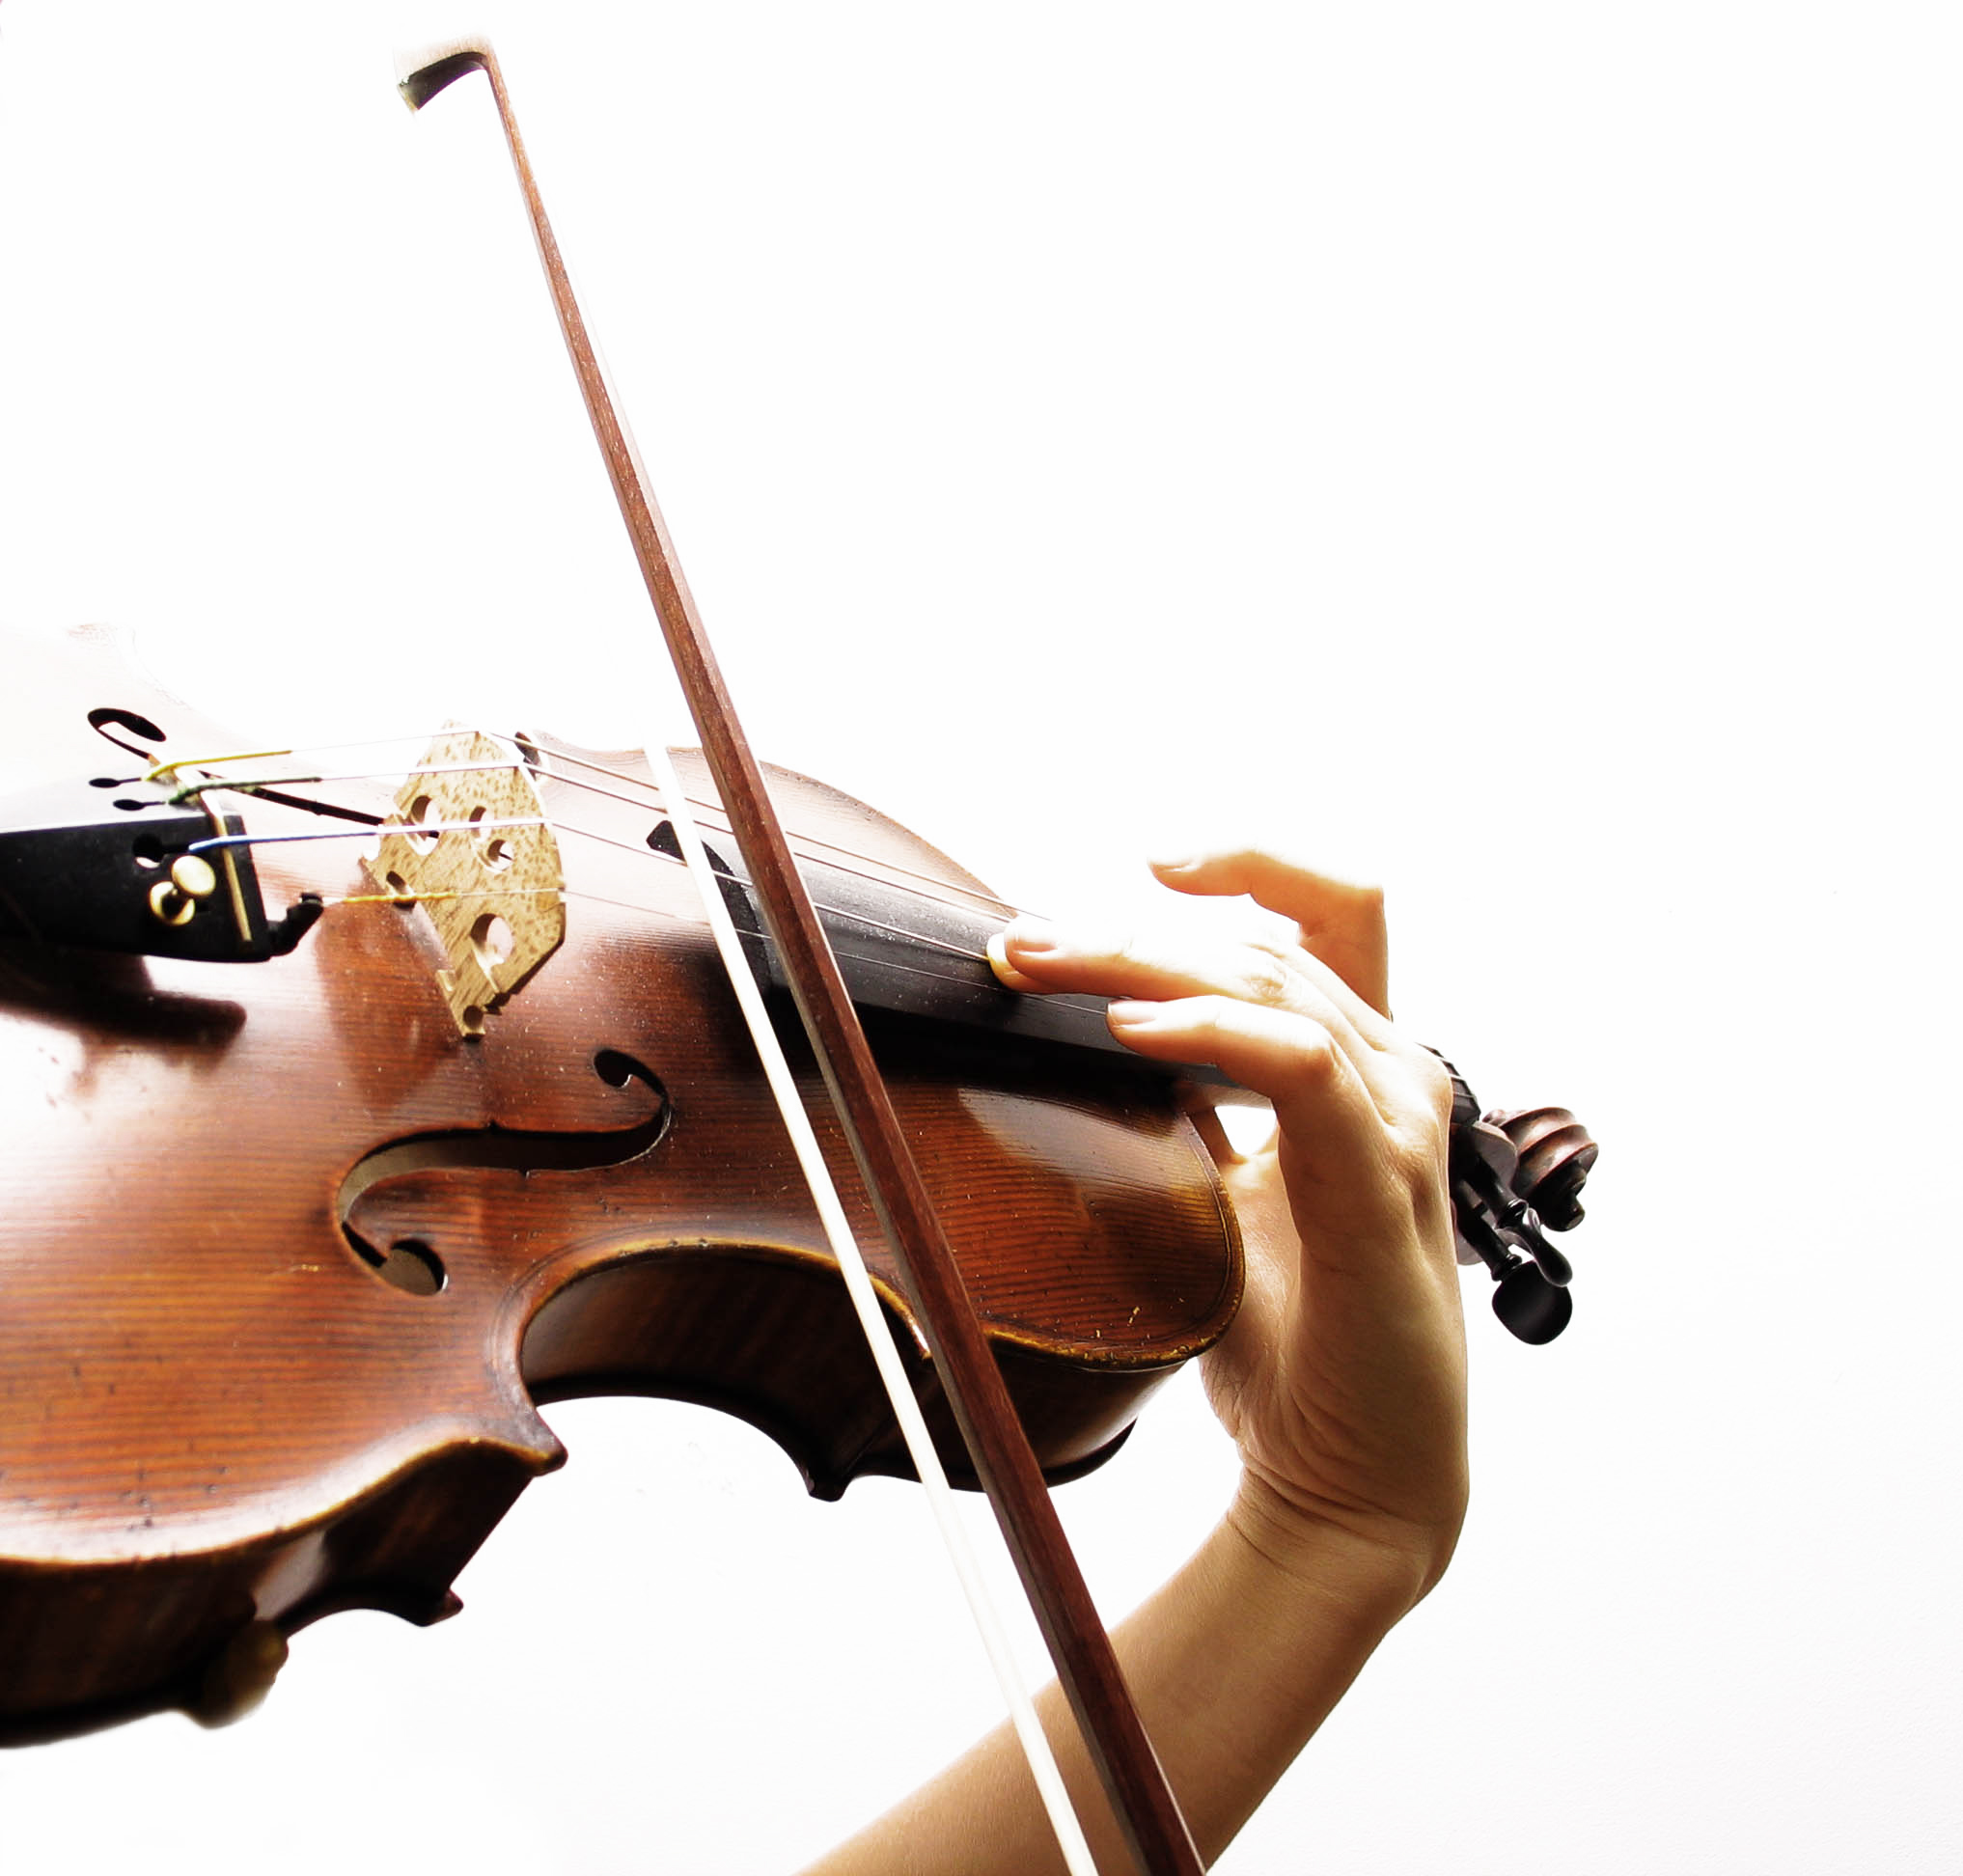 Federal-Way-School-of-Music-Violin-Viola-Lessons-Rentals